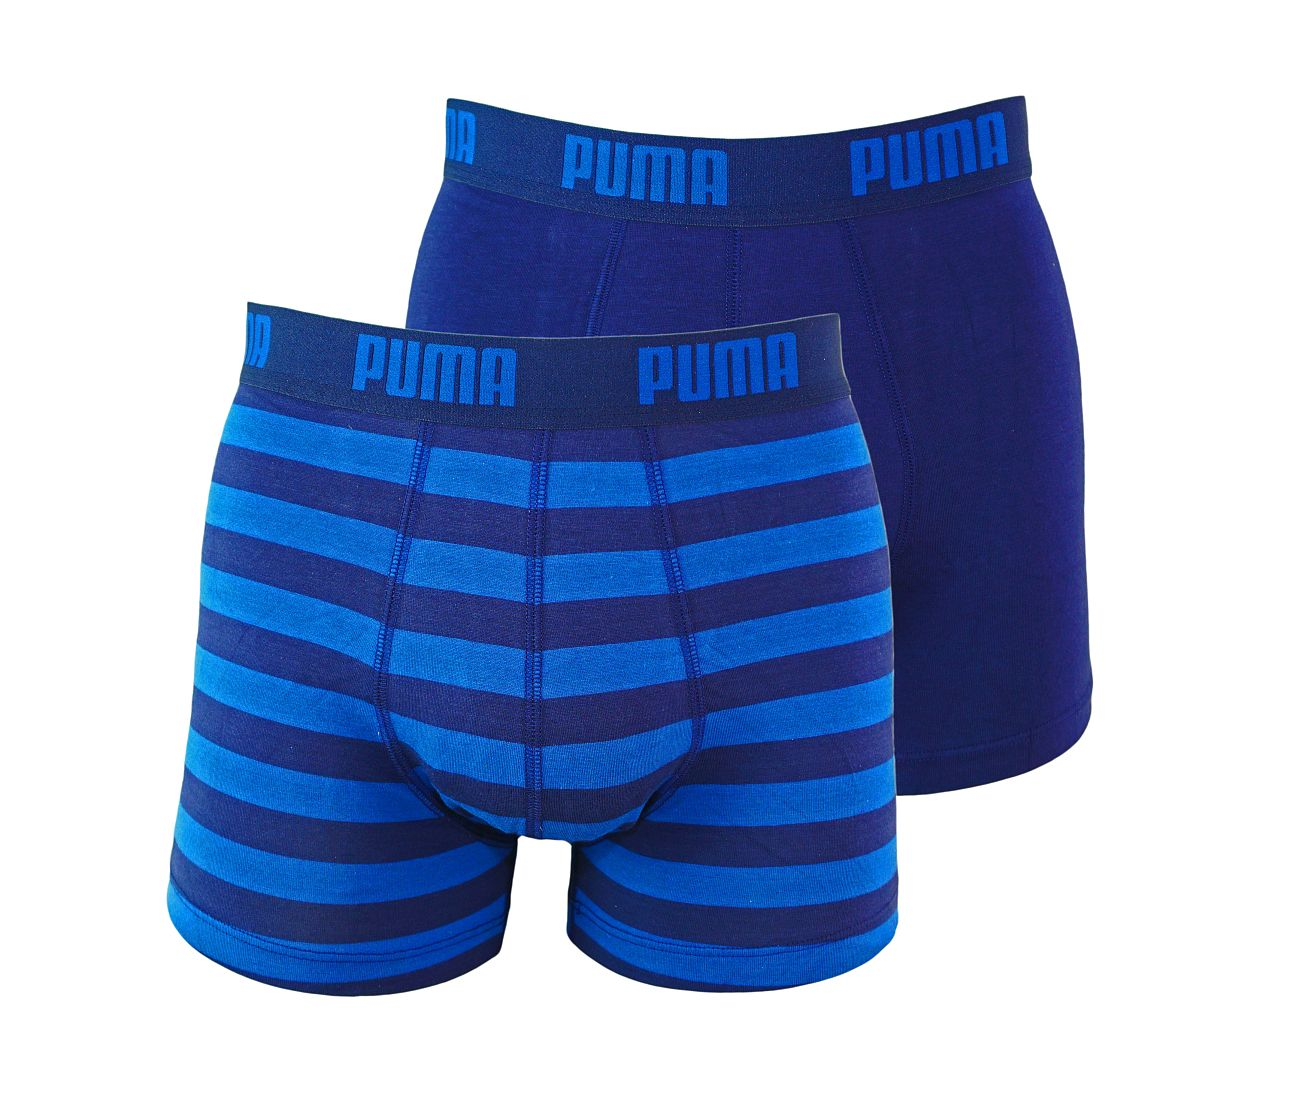 PUMA Shorts Unterhosen 2er Pack Boxer 651001001 056 020 blue SF17-PMS1